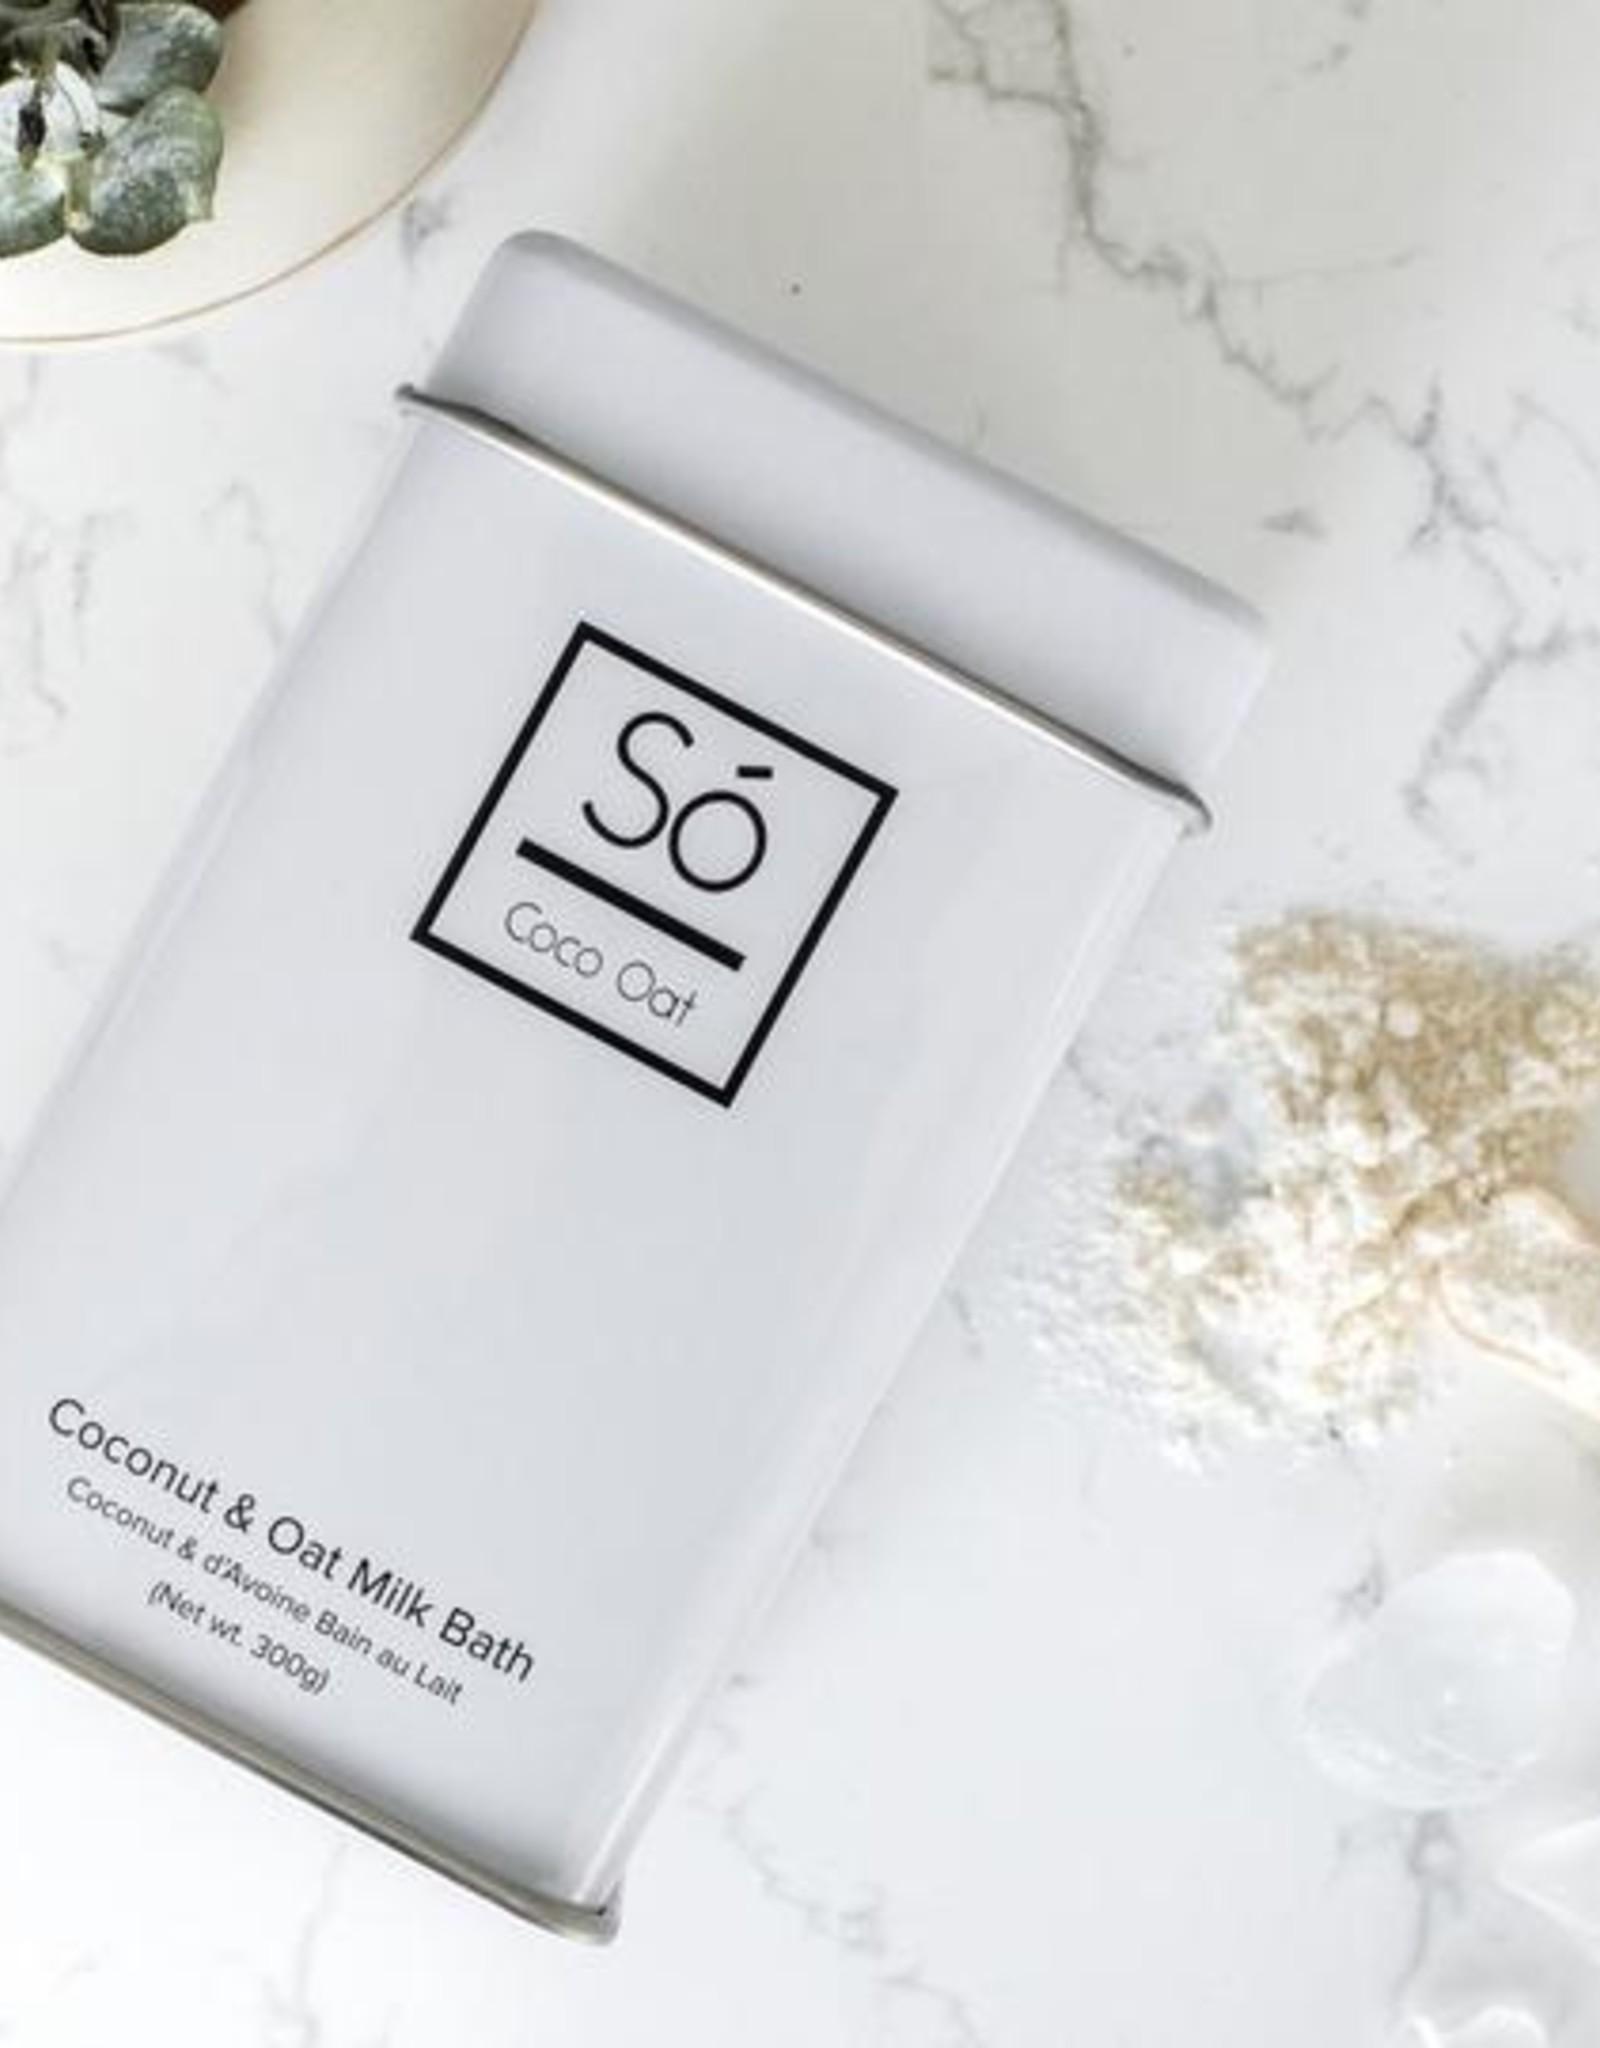 So Luxury Coco Oat Milk Bath -Tin 300g